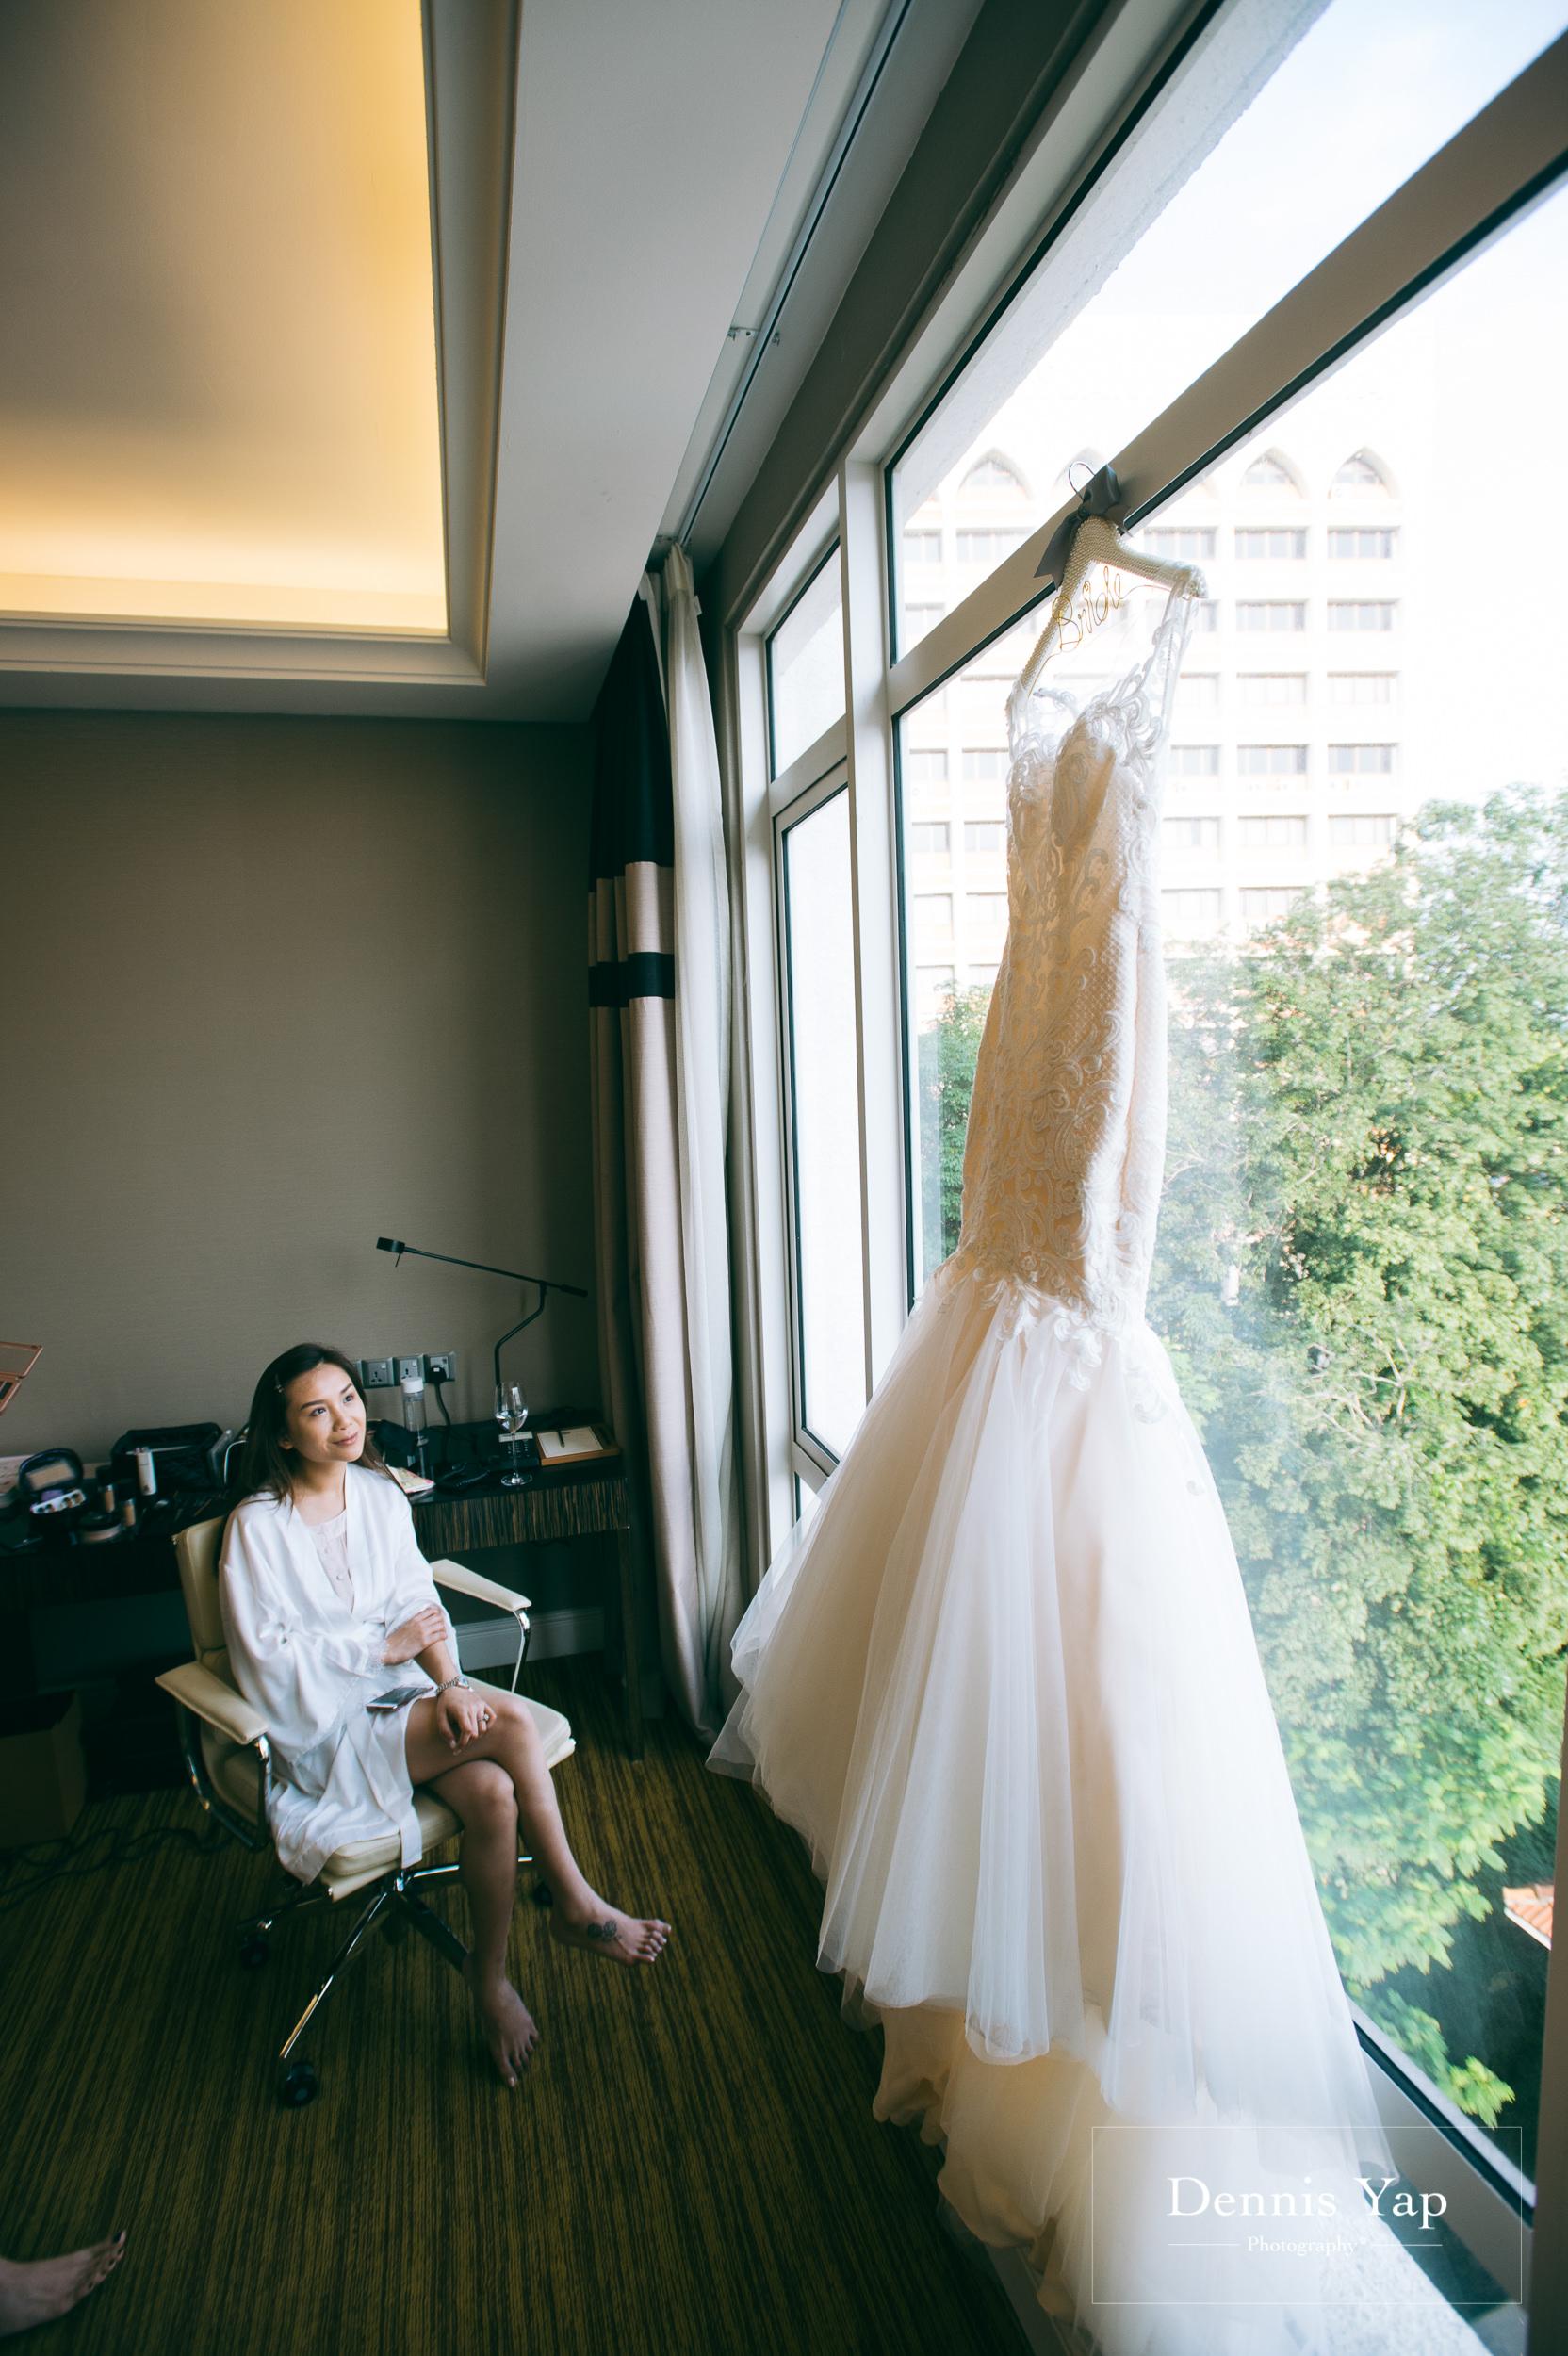 lionel joanne garden wedding majestic hotel dennis yap photography malaysia top wedding photographer-2.jpg